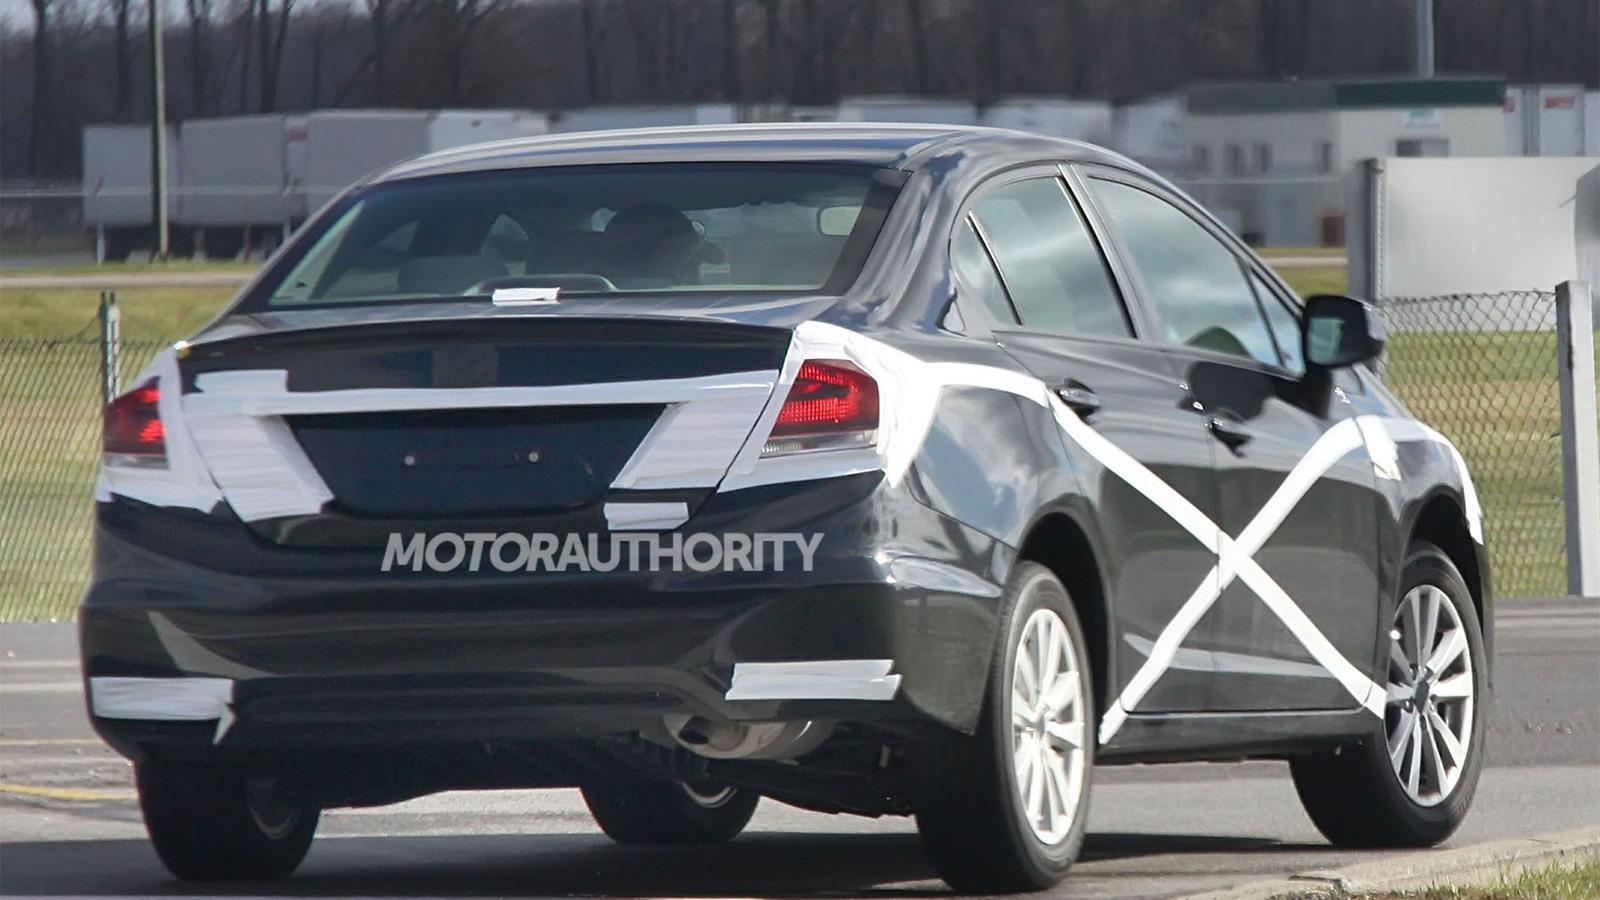 2013 Honda Civic facelift spy shots